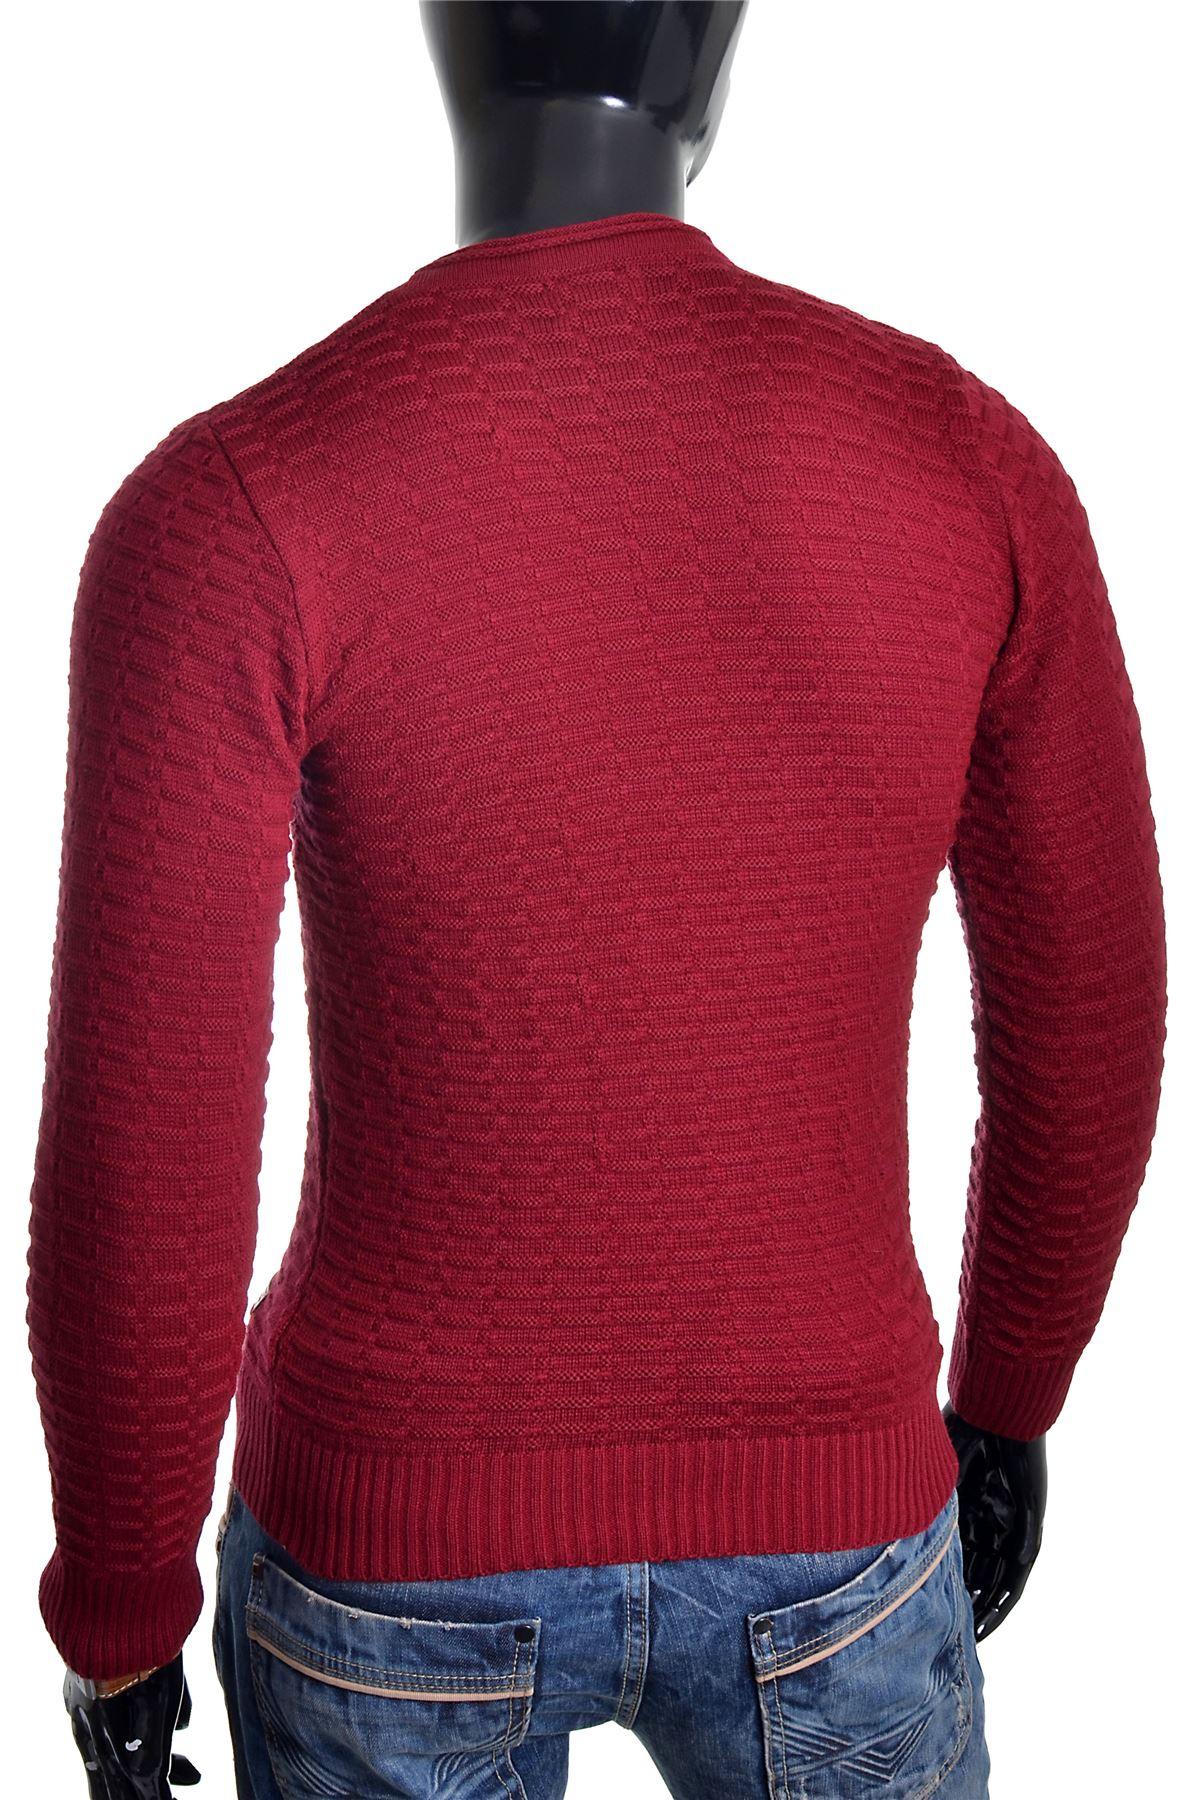 Men-039-s-Jumper-Striped-Knit-Smart-Long-Sleeve-Sweater-Crew-Neck-Top-Slim-Fitness thumbnail 6